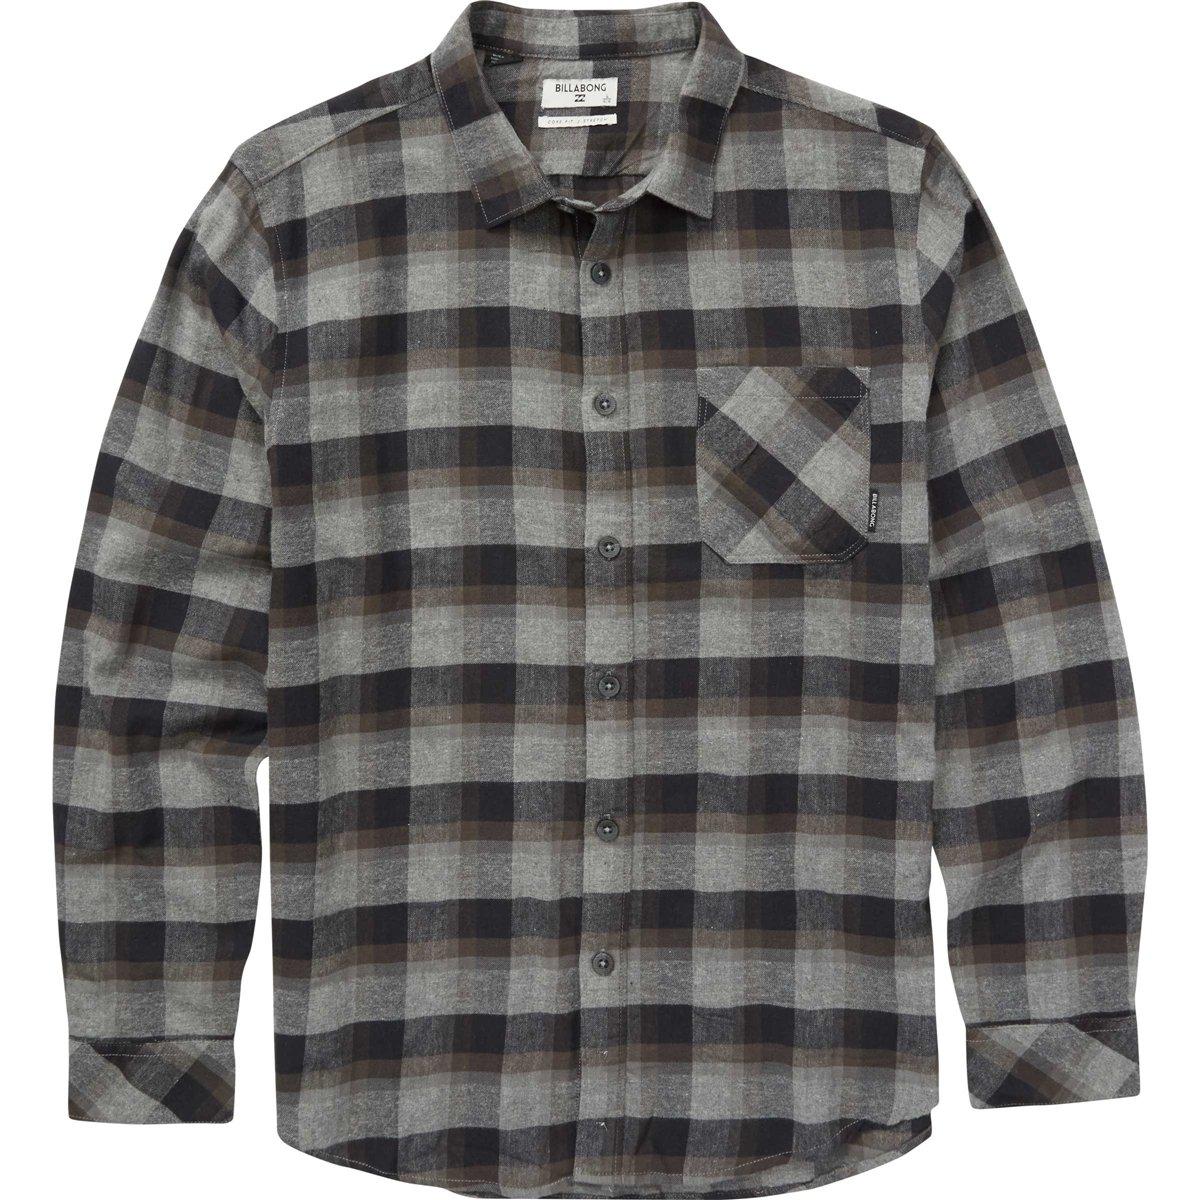 Billabong Boys' Big Freemont Flannel Shirt, Black, M